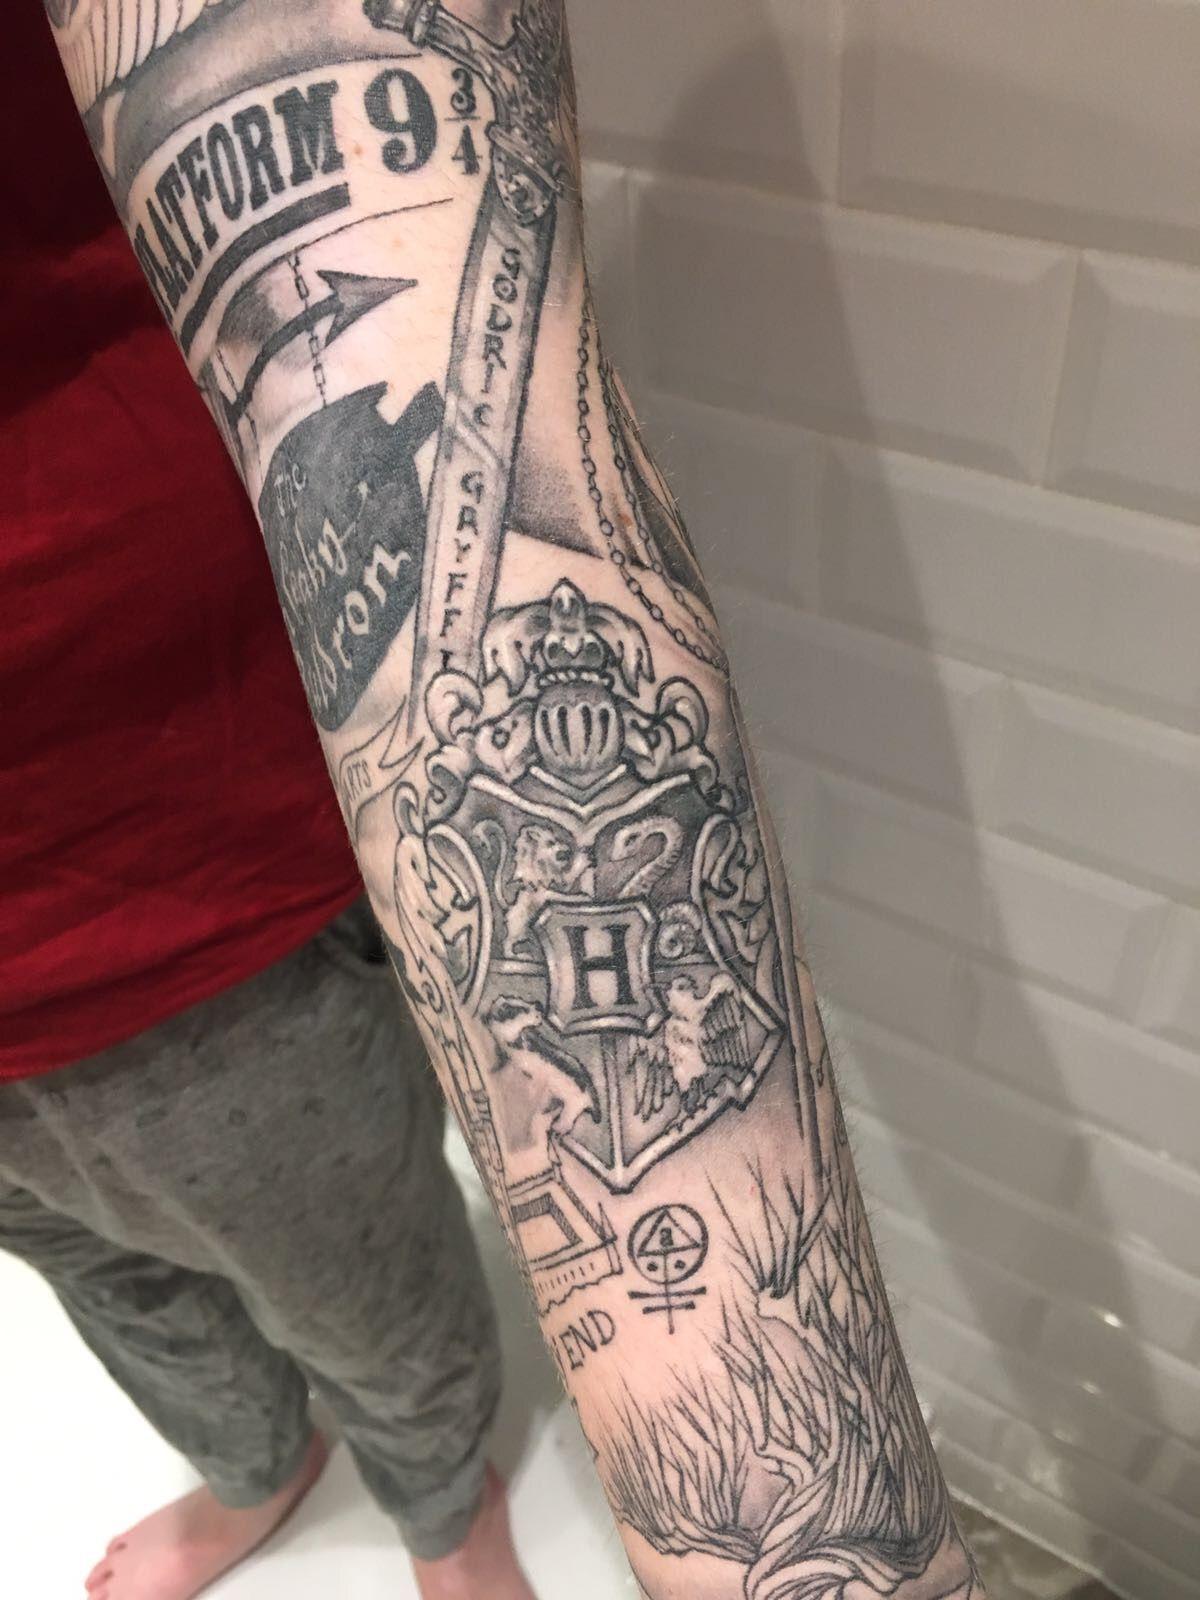 Harry potter sleeve tattoo google search harry potter for Harry potter sleeve tattoo